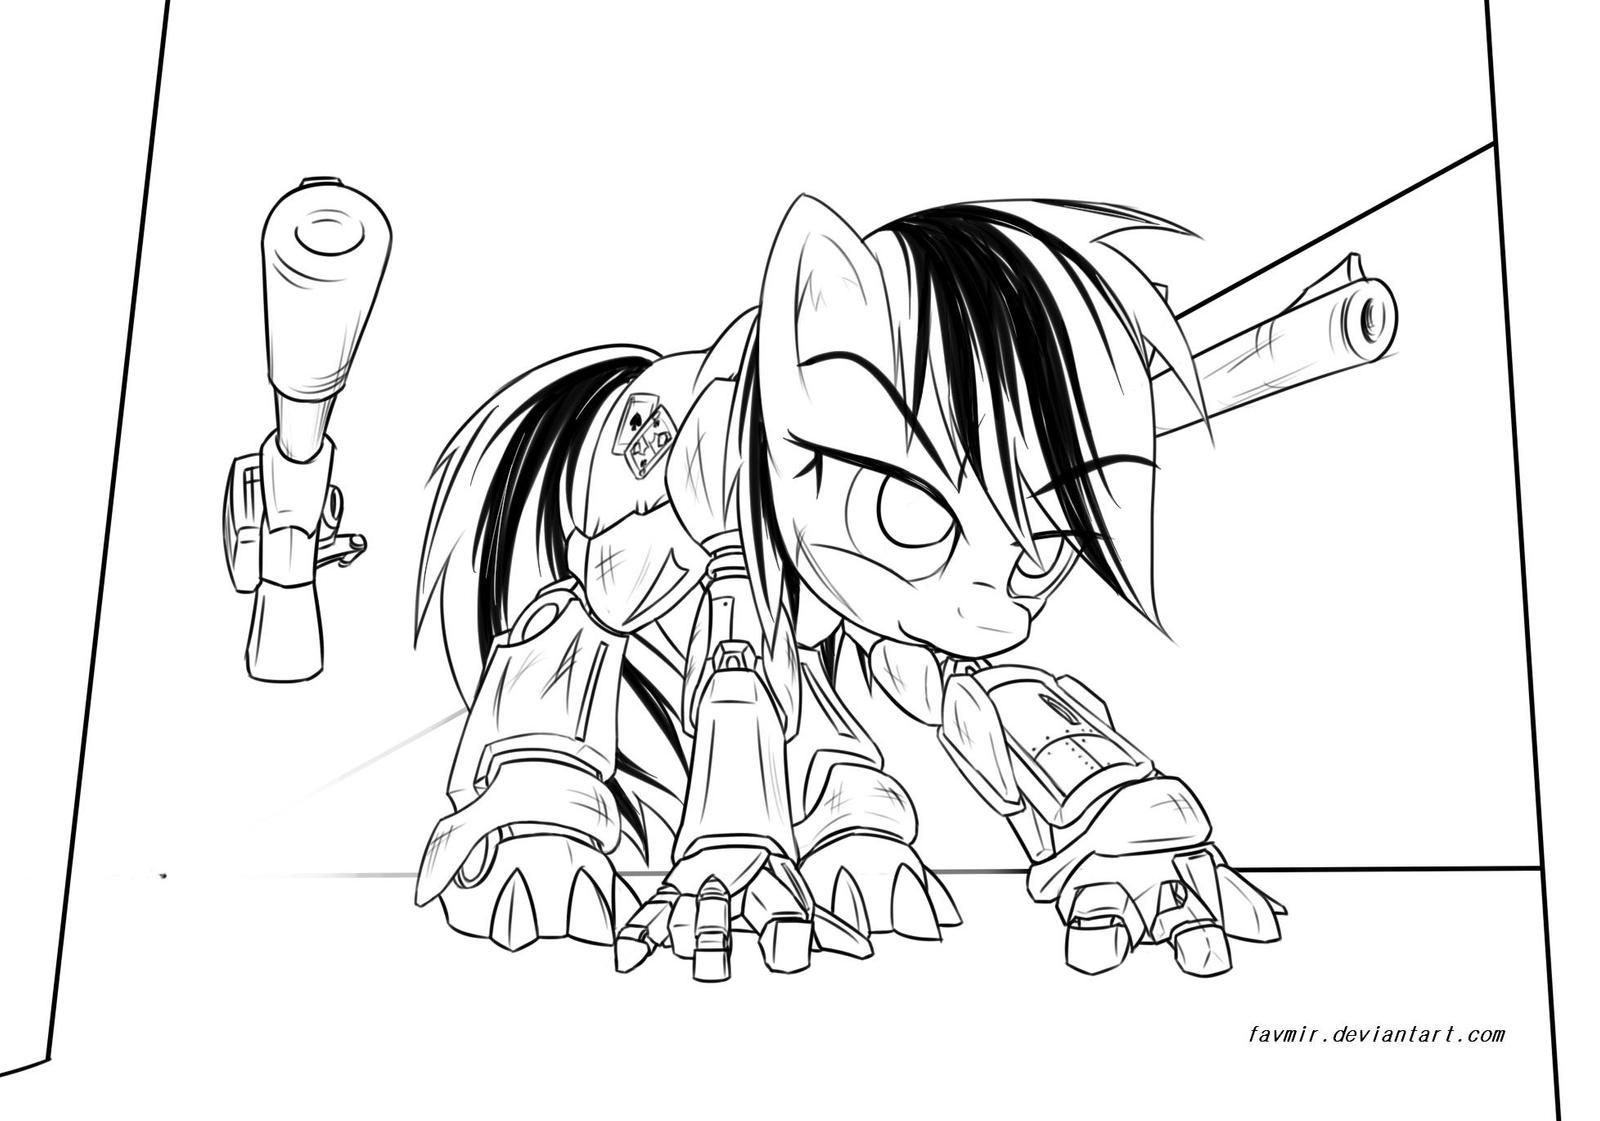 Sketch: Blackjack by favmir